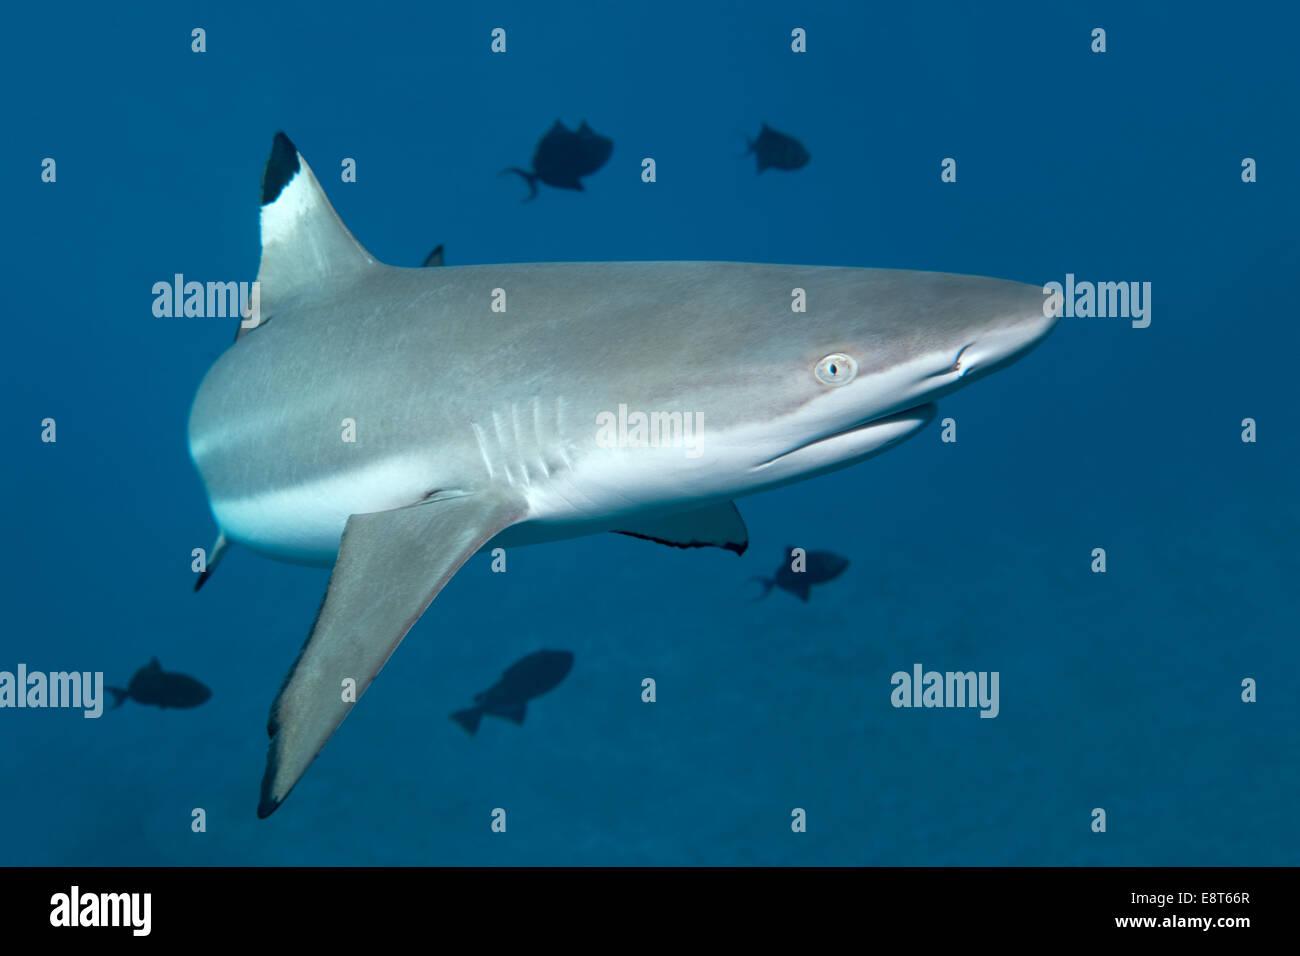 Blacktip Reef Shark (Carcharhinus melanopterus), with Niger Trigger Fish (Odonus niger), UNESCO World Heritage Site Stock Photo